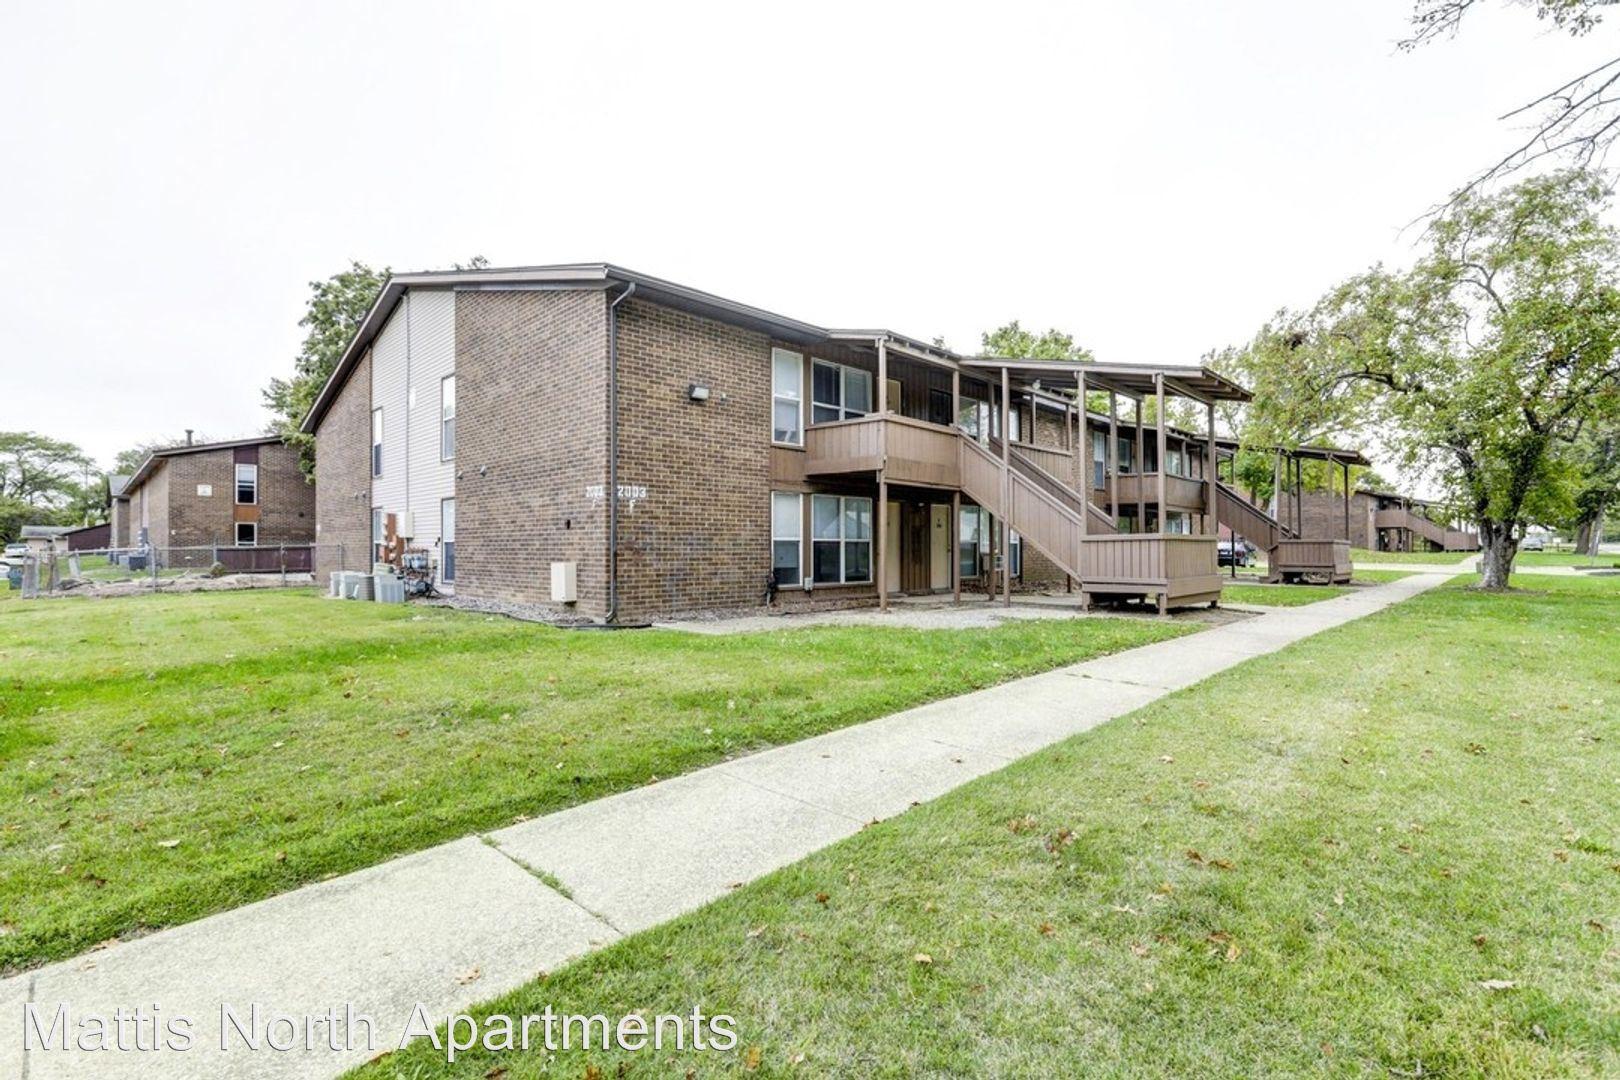 Apartments Near Parkland Mattis North Apartments for Parkland College Students in Champaign, IL